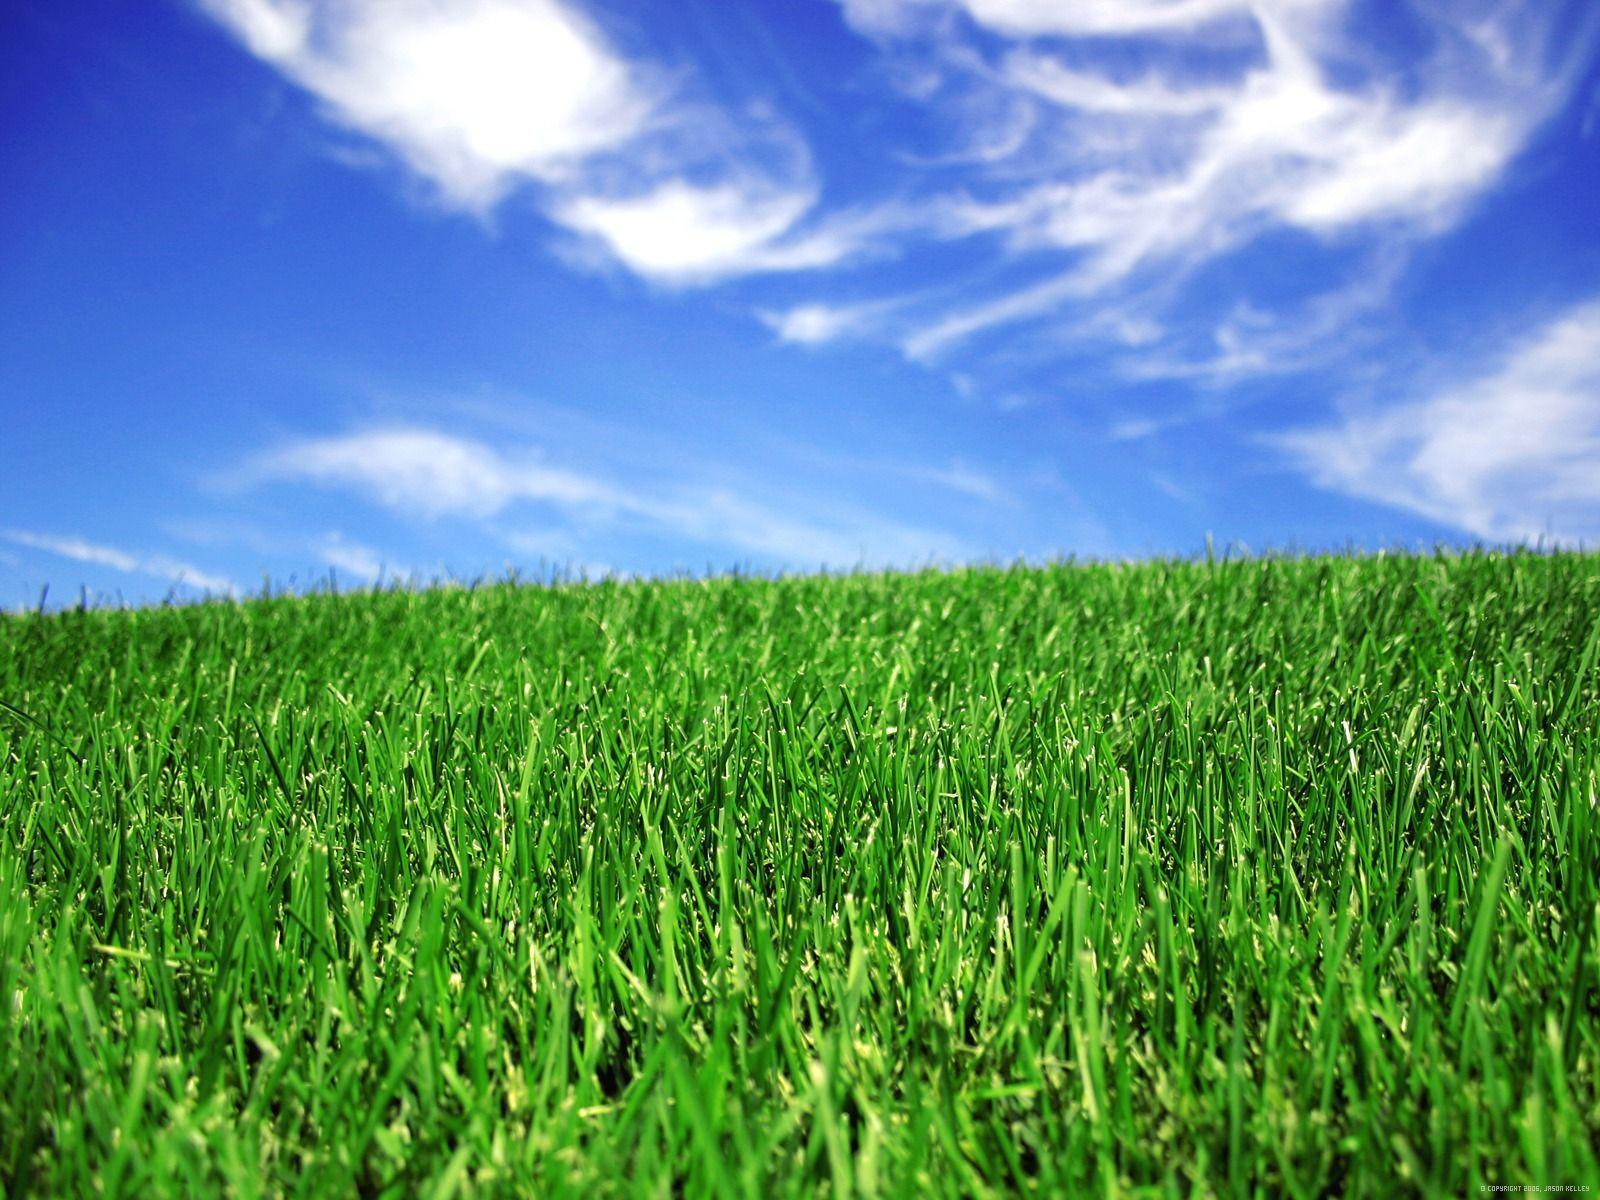 Green Lawn 1 YI25ANCA73 1600x1200jpg